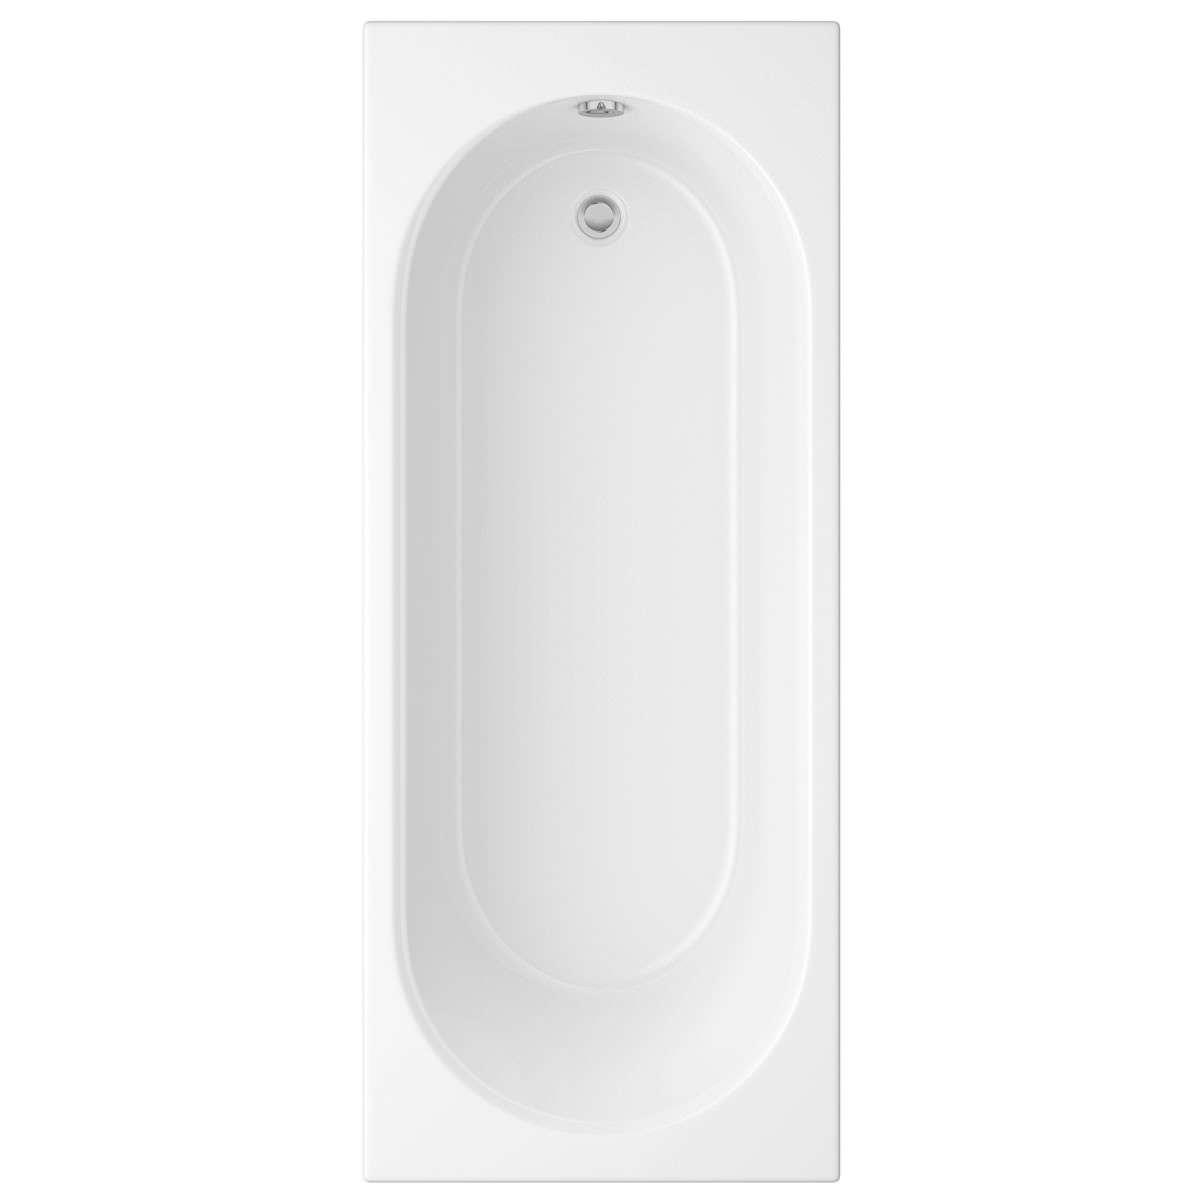 Designer Bathroom Accessories Trojan Cascade White Single Ended Bath 1700 X 700mm 2